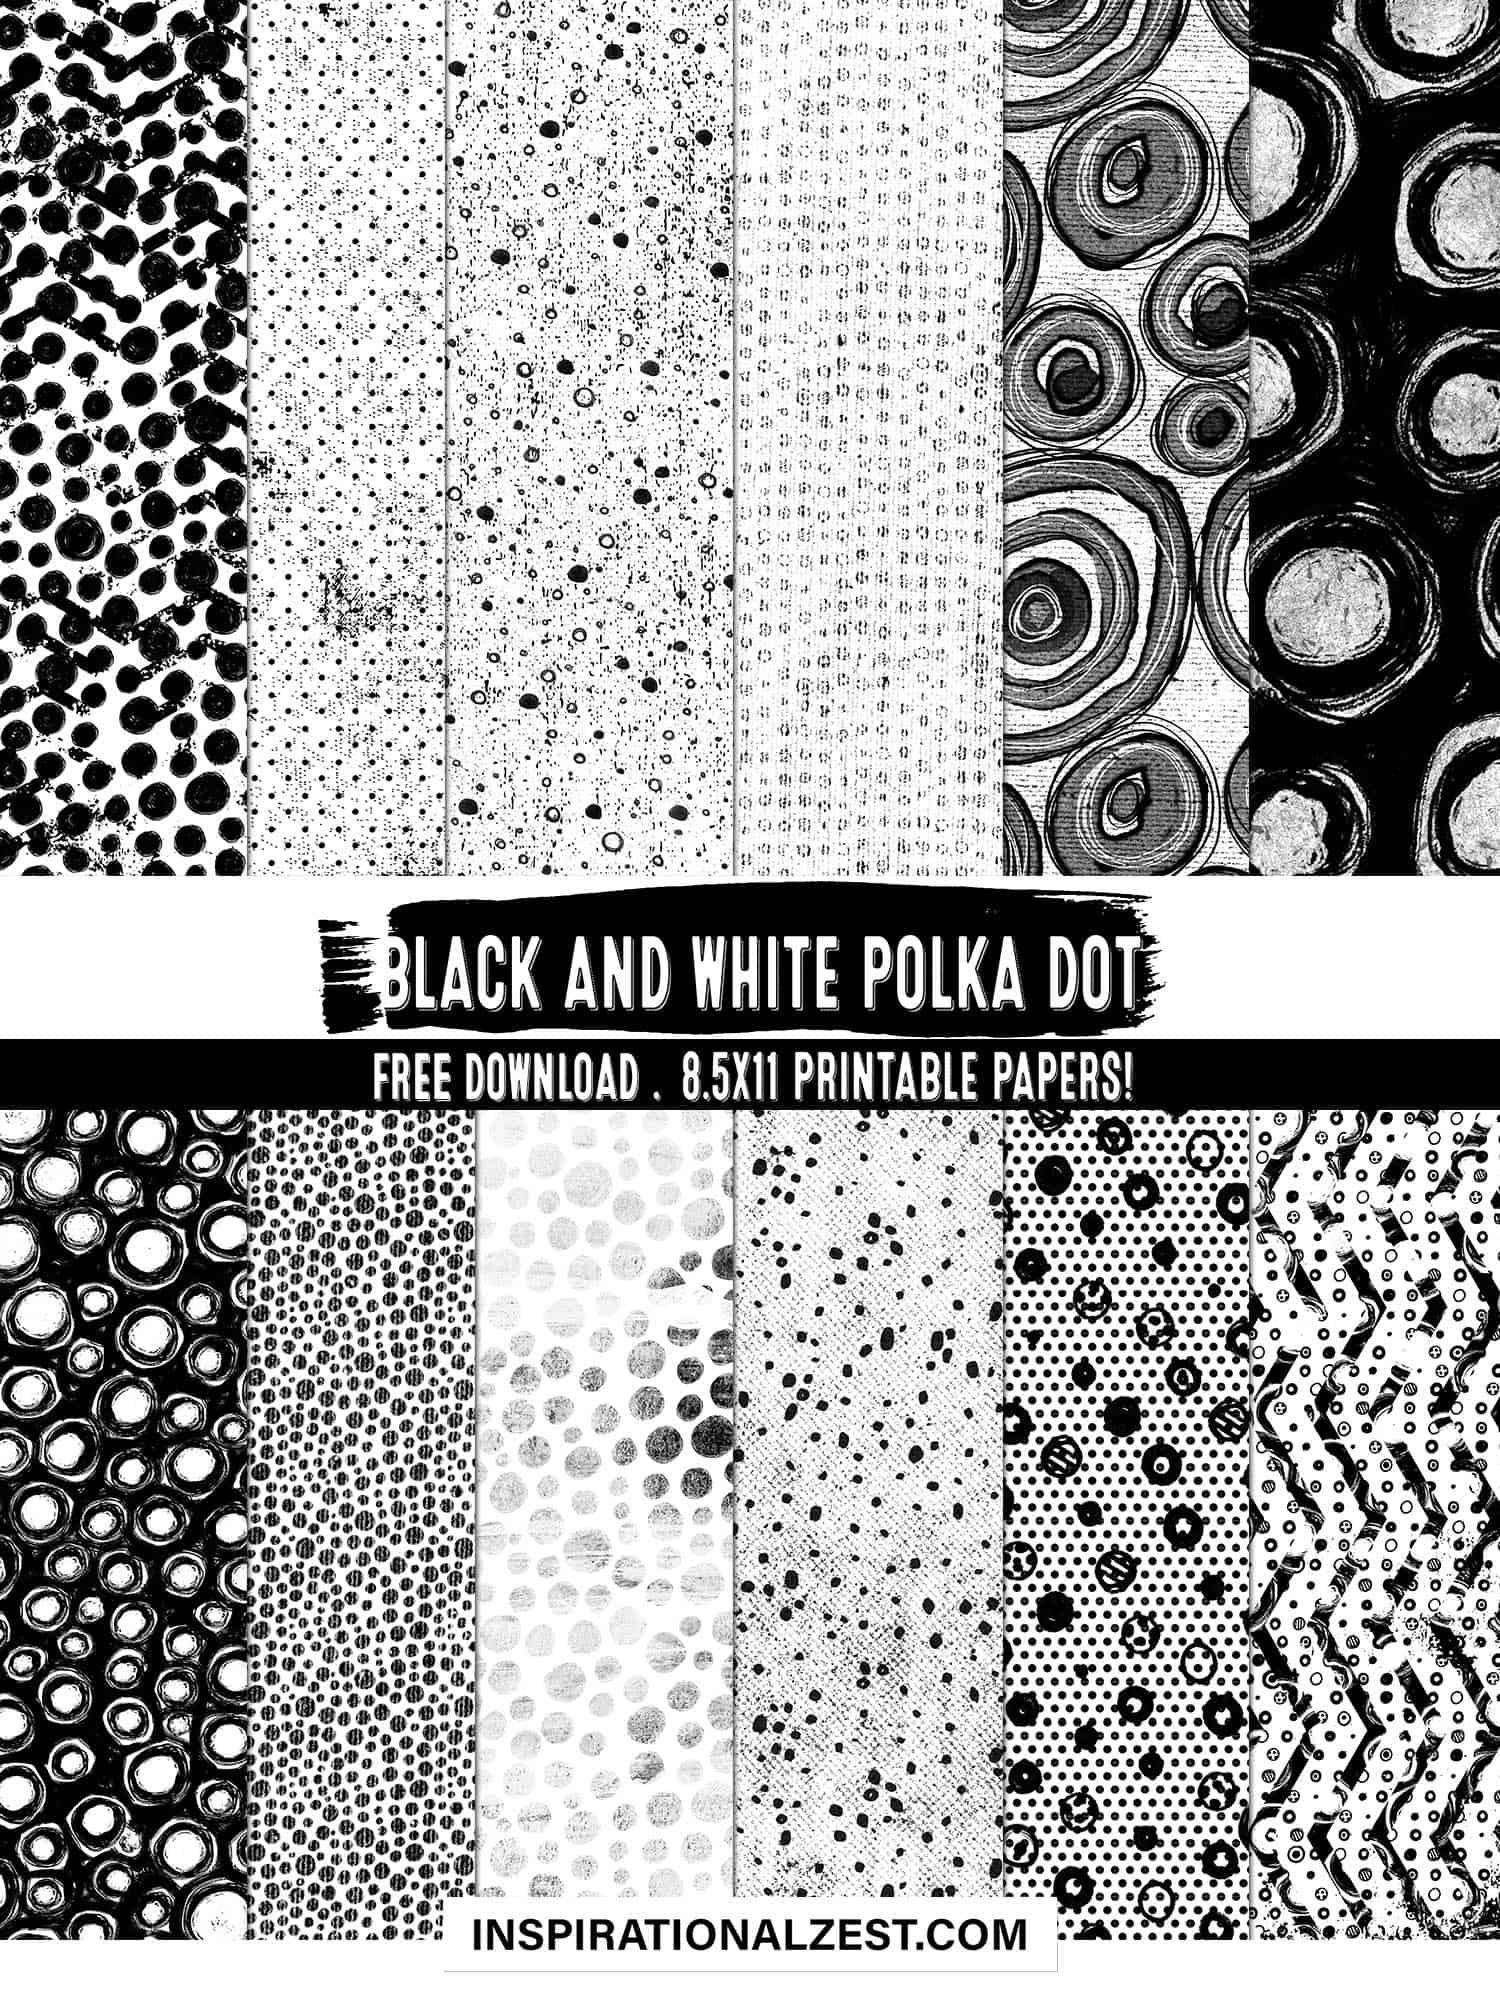 Free Printable Pattern Paper | Black and White Polka Dot